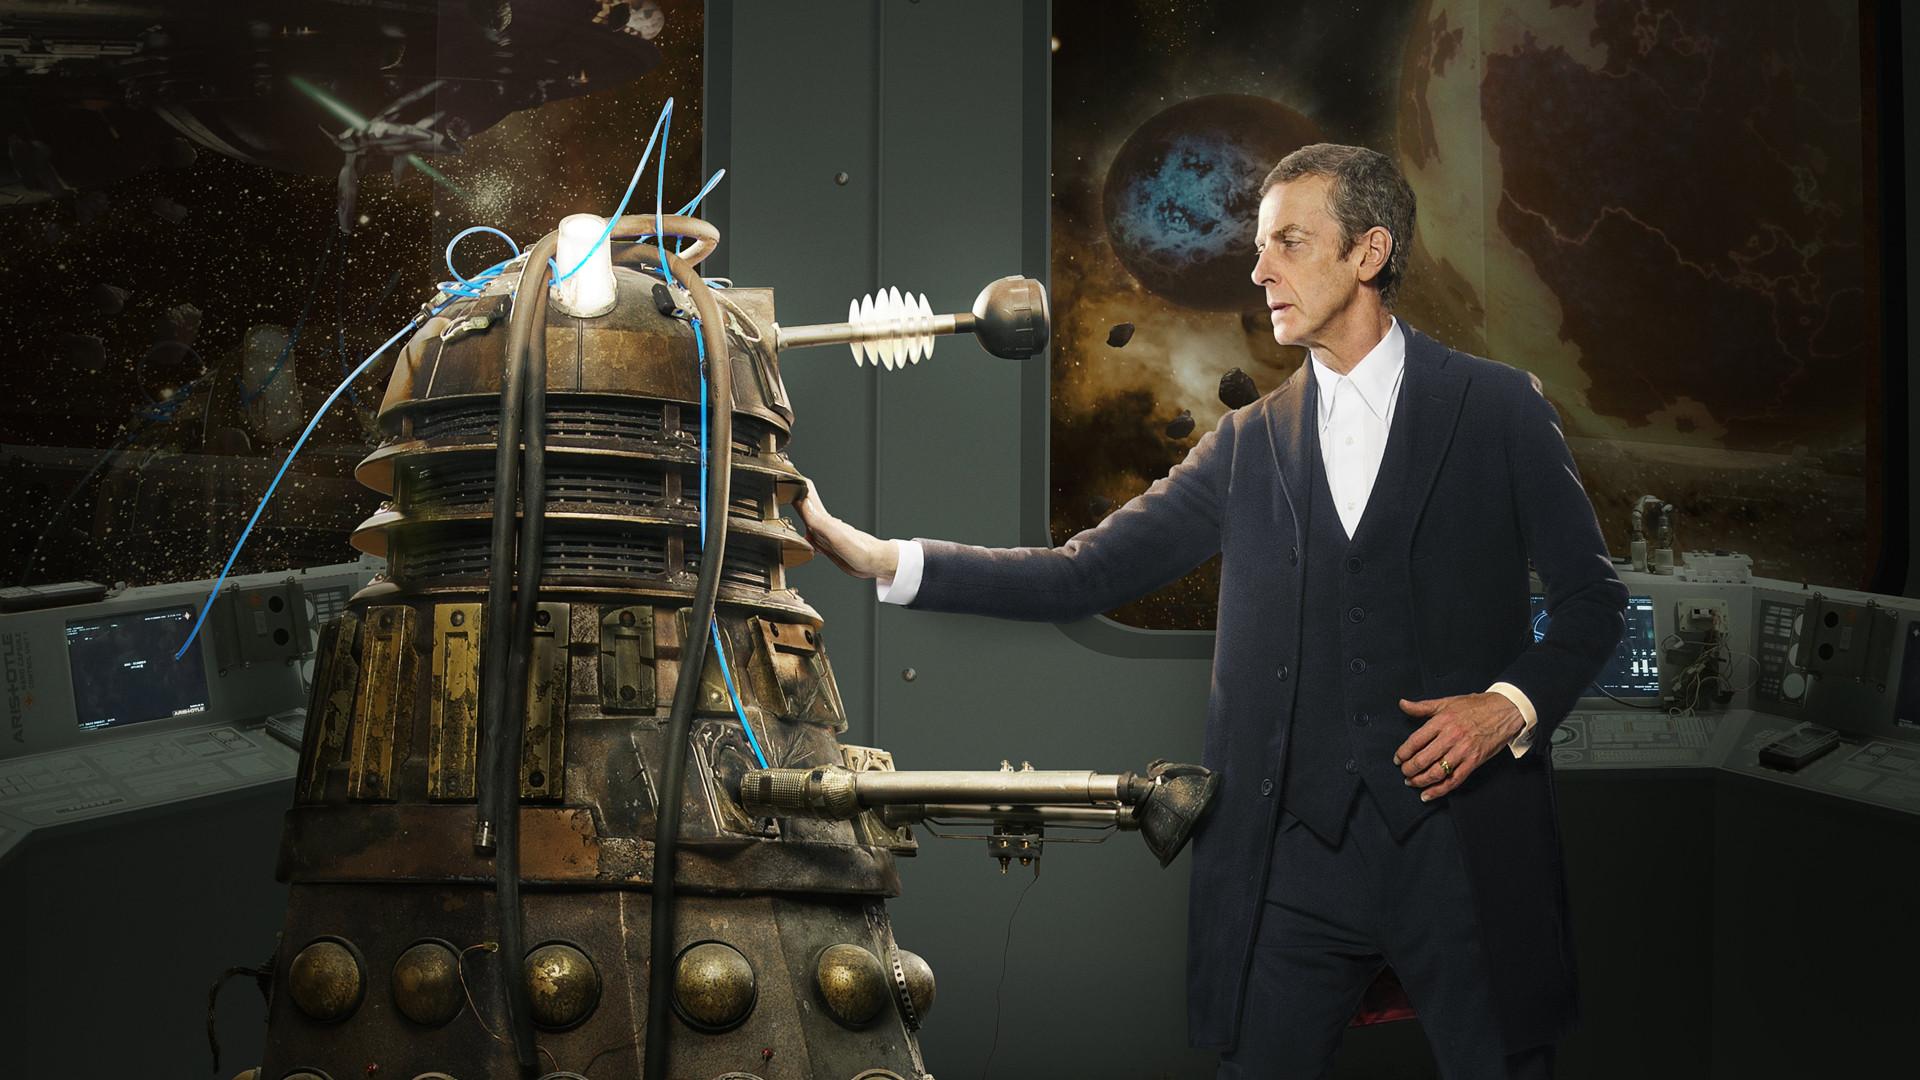 Into The Dalek Wallpaper   Album on Imgur 1920x1080